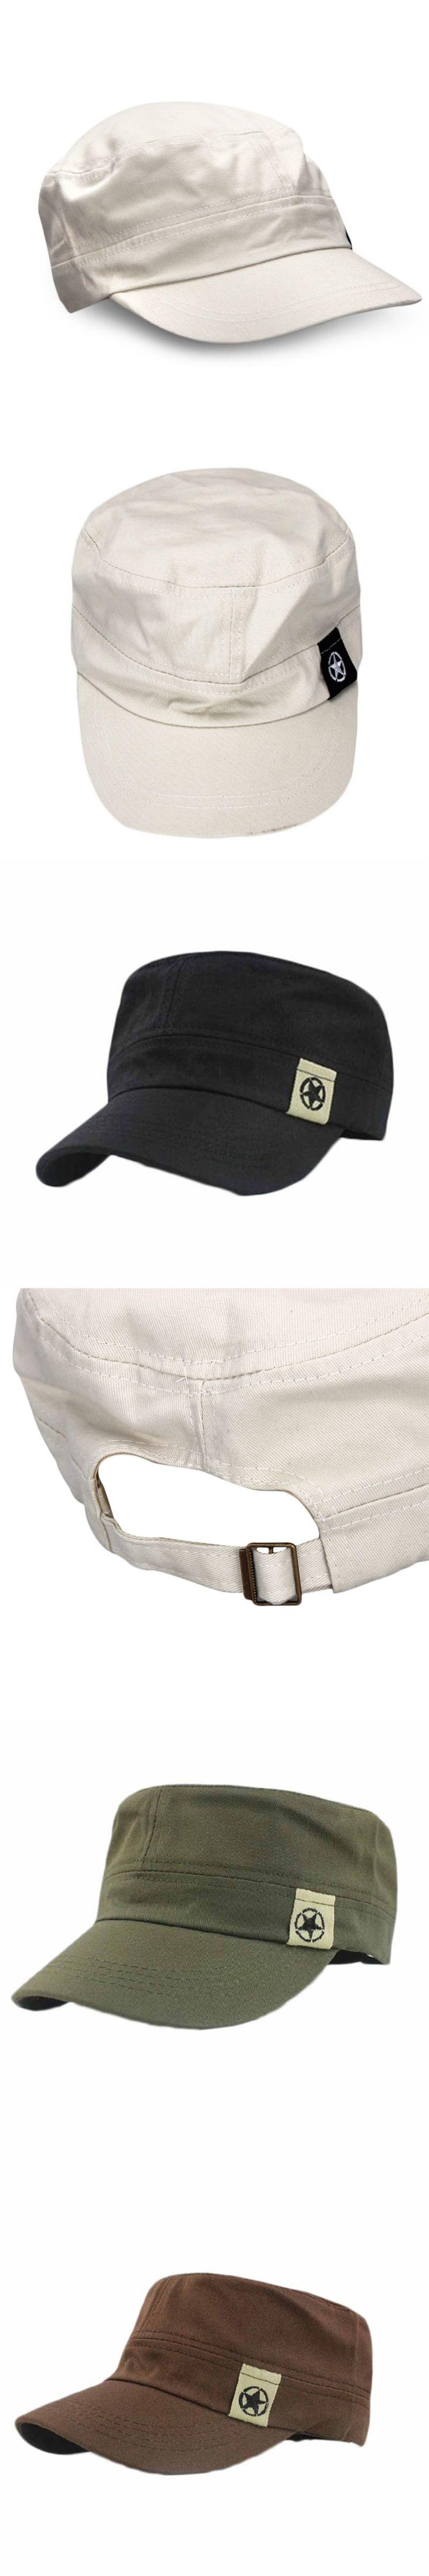 b187b426067 Adjustable Men Women Unisex Flat Roof Military Hat Cadet Patrol Bush  Baseball Field Cap Army hat